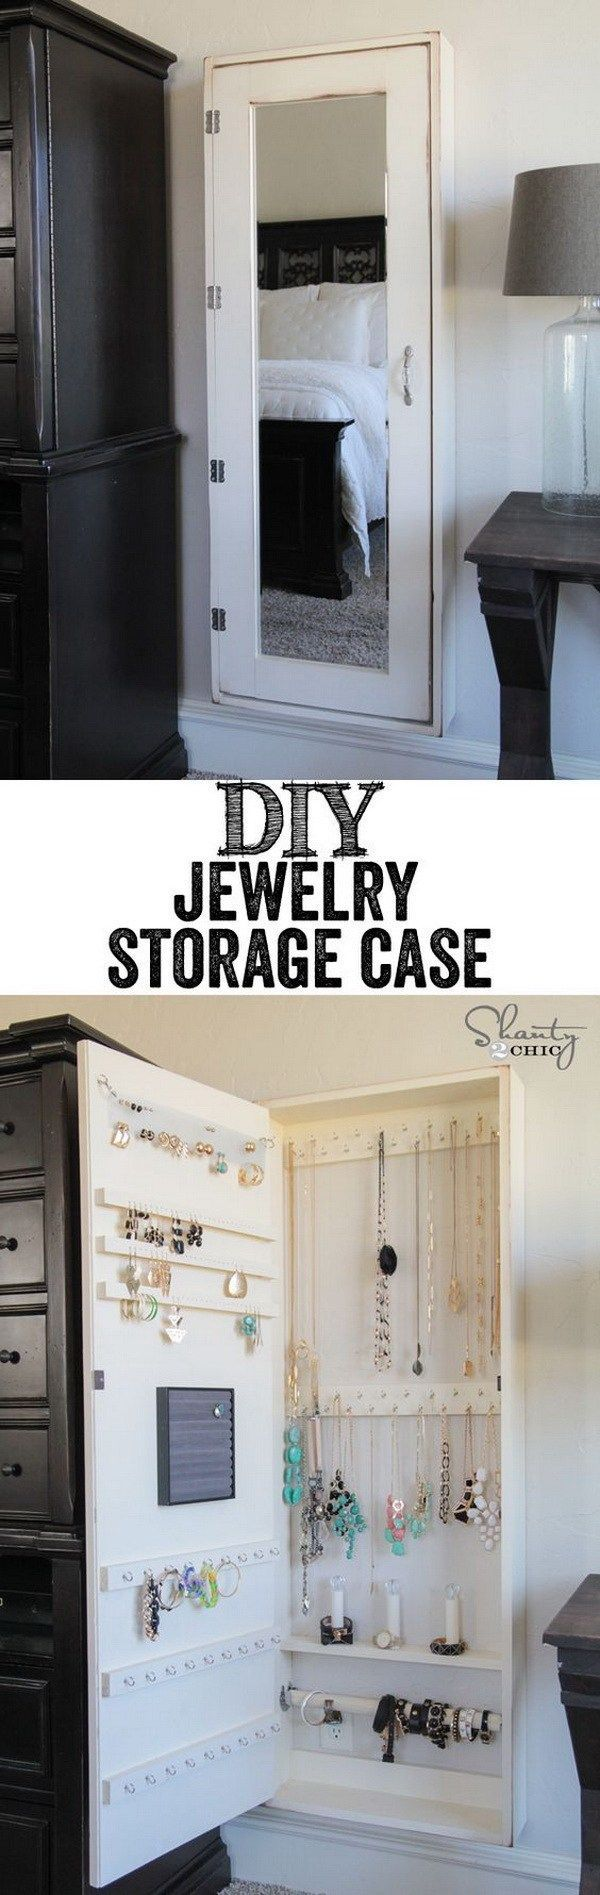 36 best DIY Jewelry Organizers images on Pinterest Jewelry